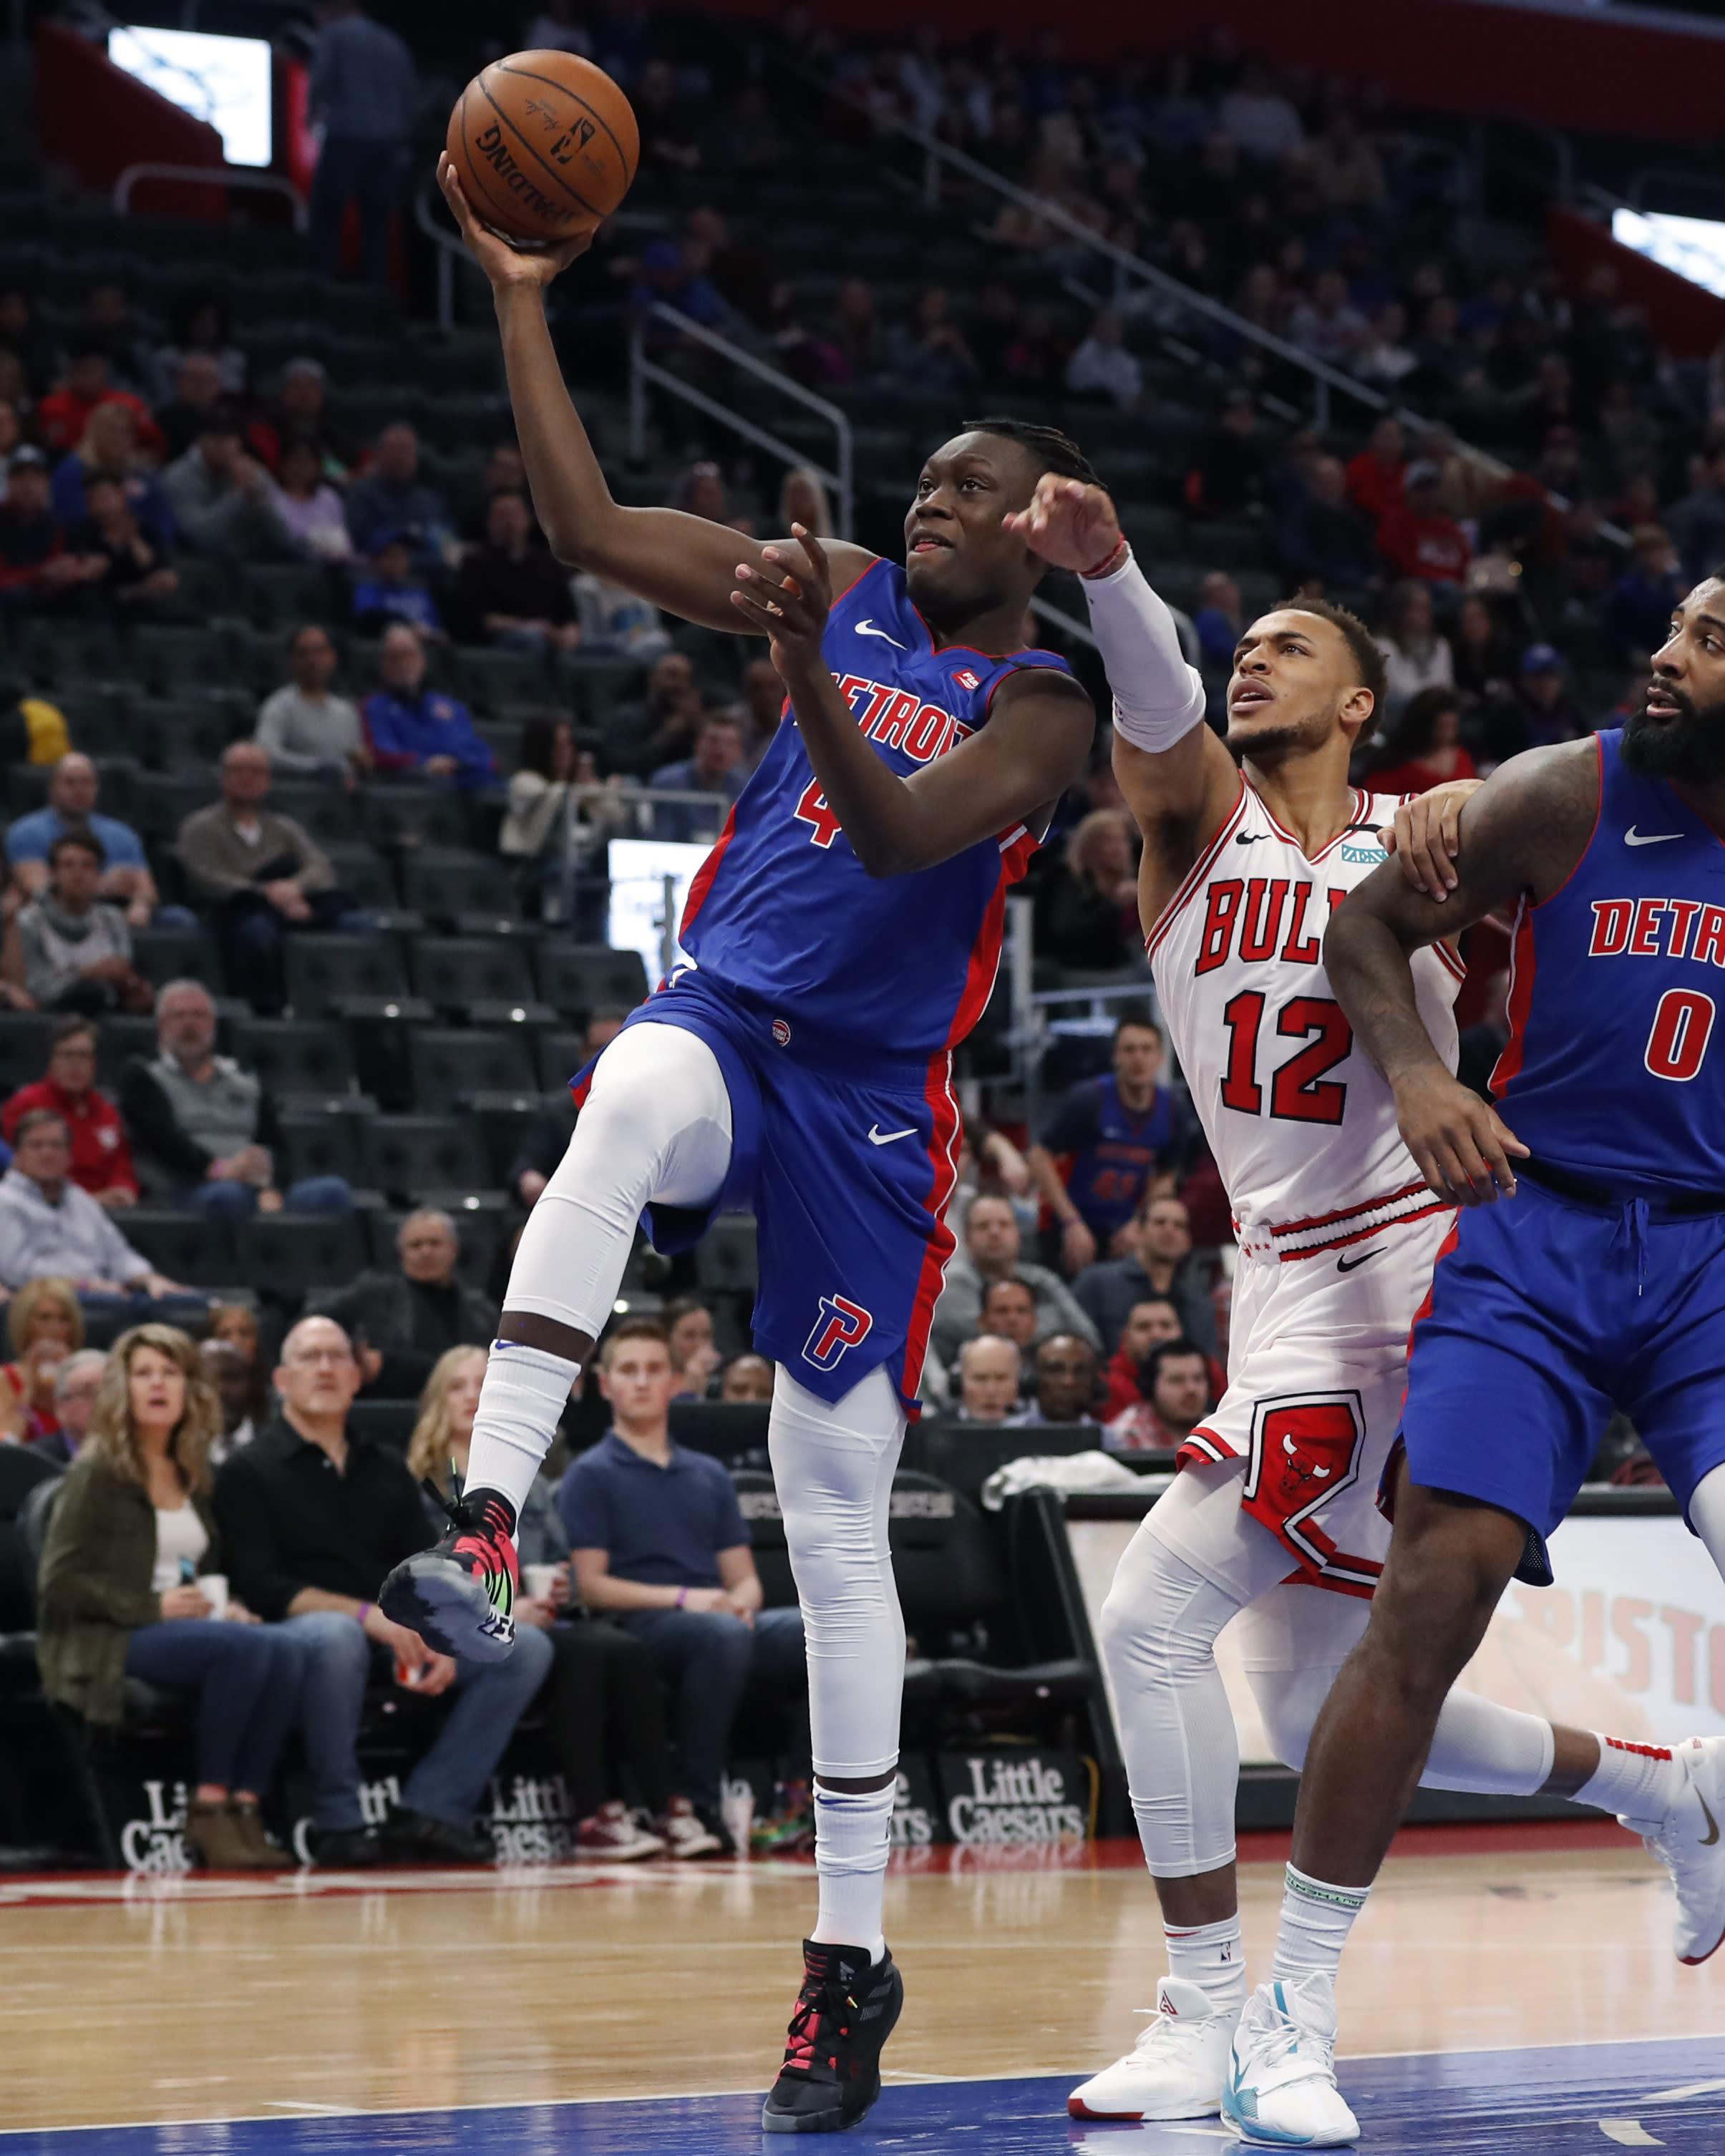 Detroit Pistons forward Sekou Doumbouya (45) makes a layup as Chicago Bulls forward Daniel Gafford (12) reaches in during the first half of an NBA basketball game, Saturday, Jan. 11, 2020, in Detroit. (AP Photo/Carlos Osorio)